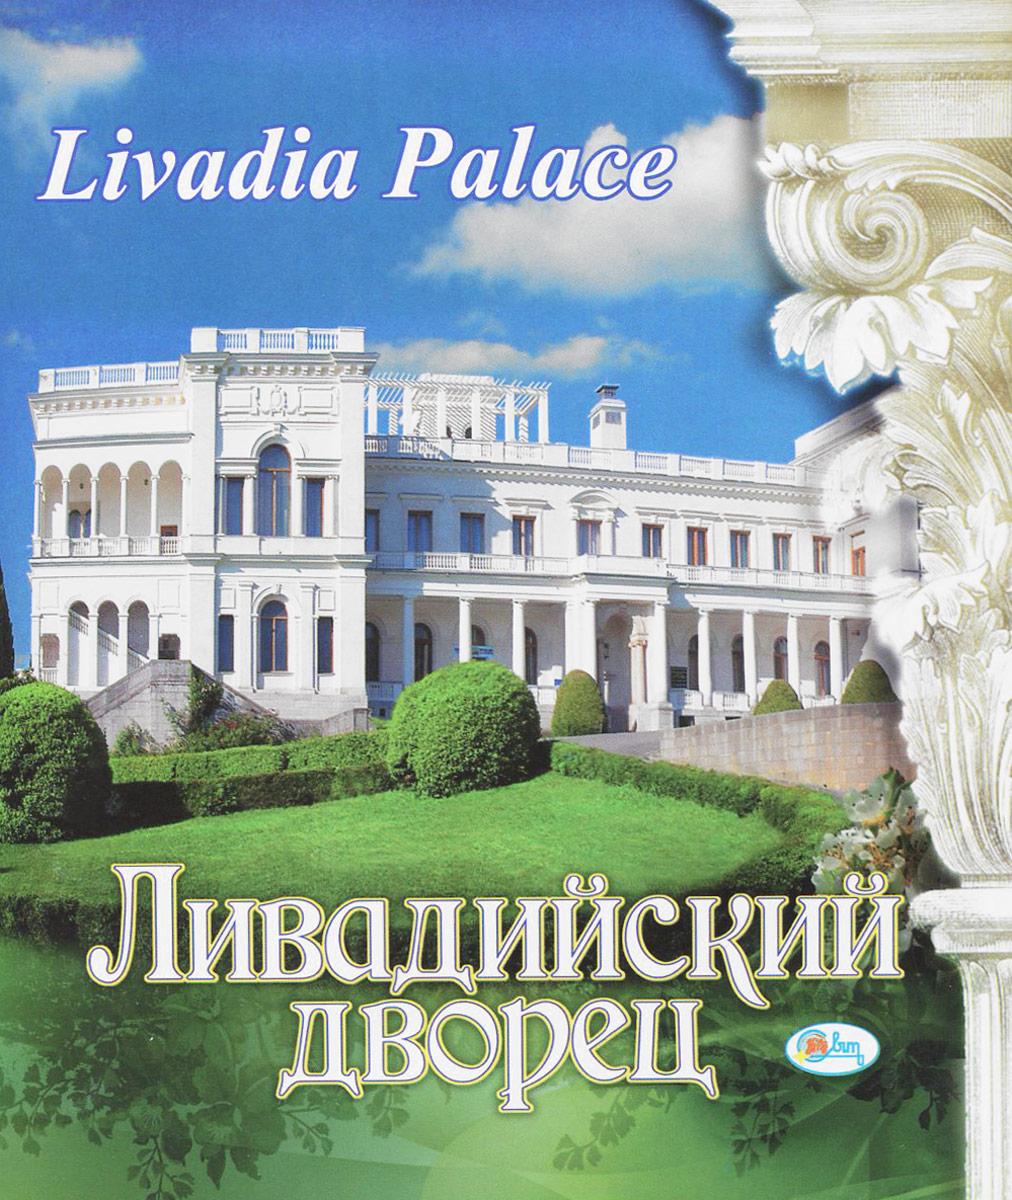 Livadia Palace / Ливадийский дворец. Фотоальбом